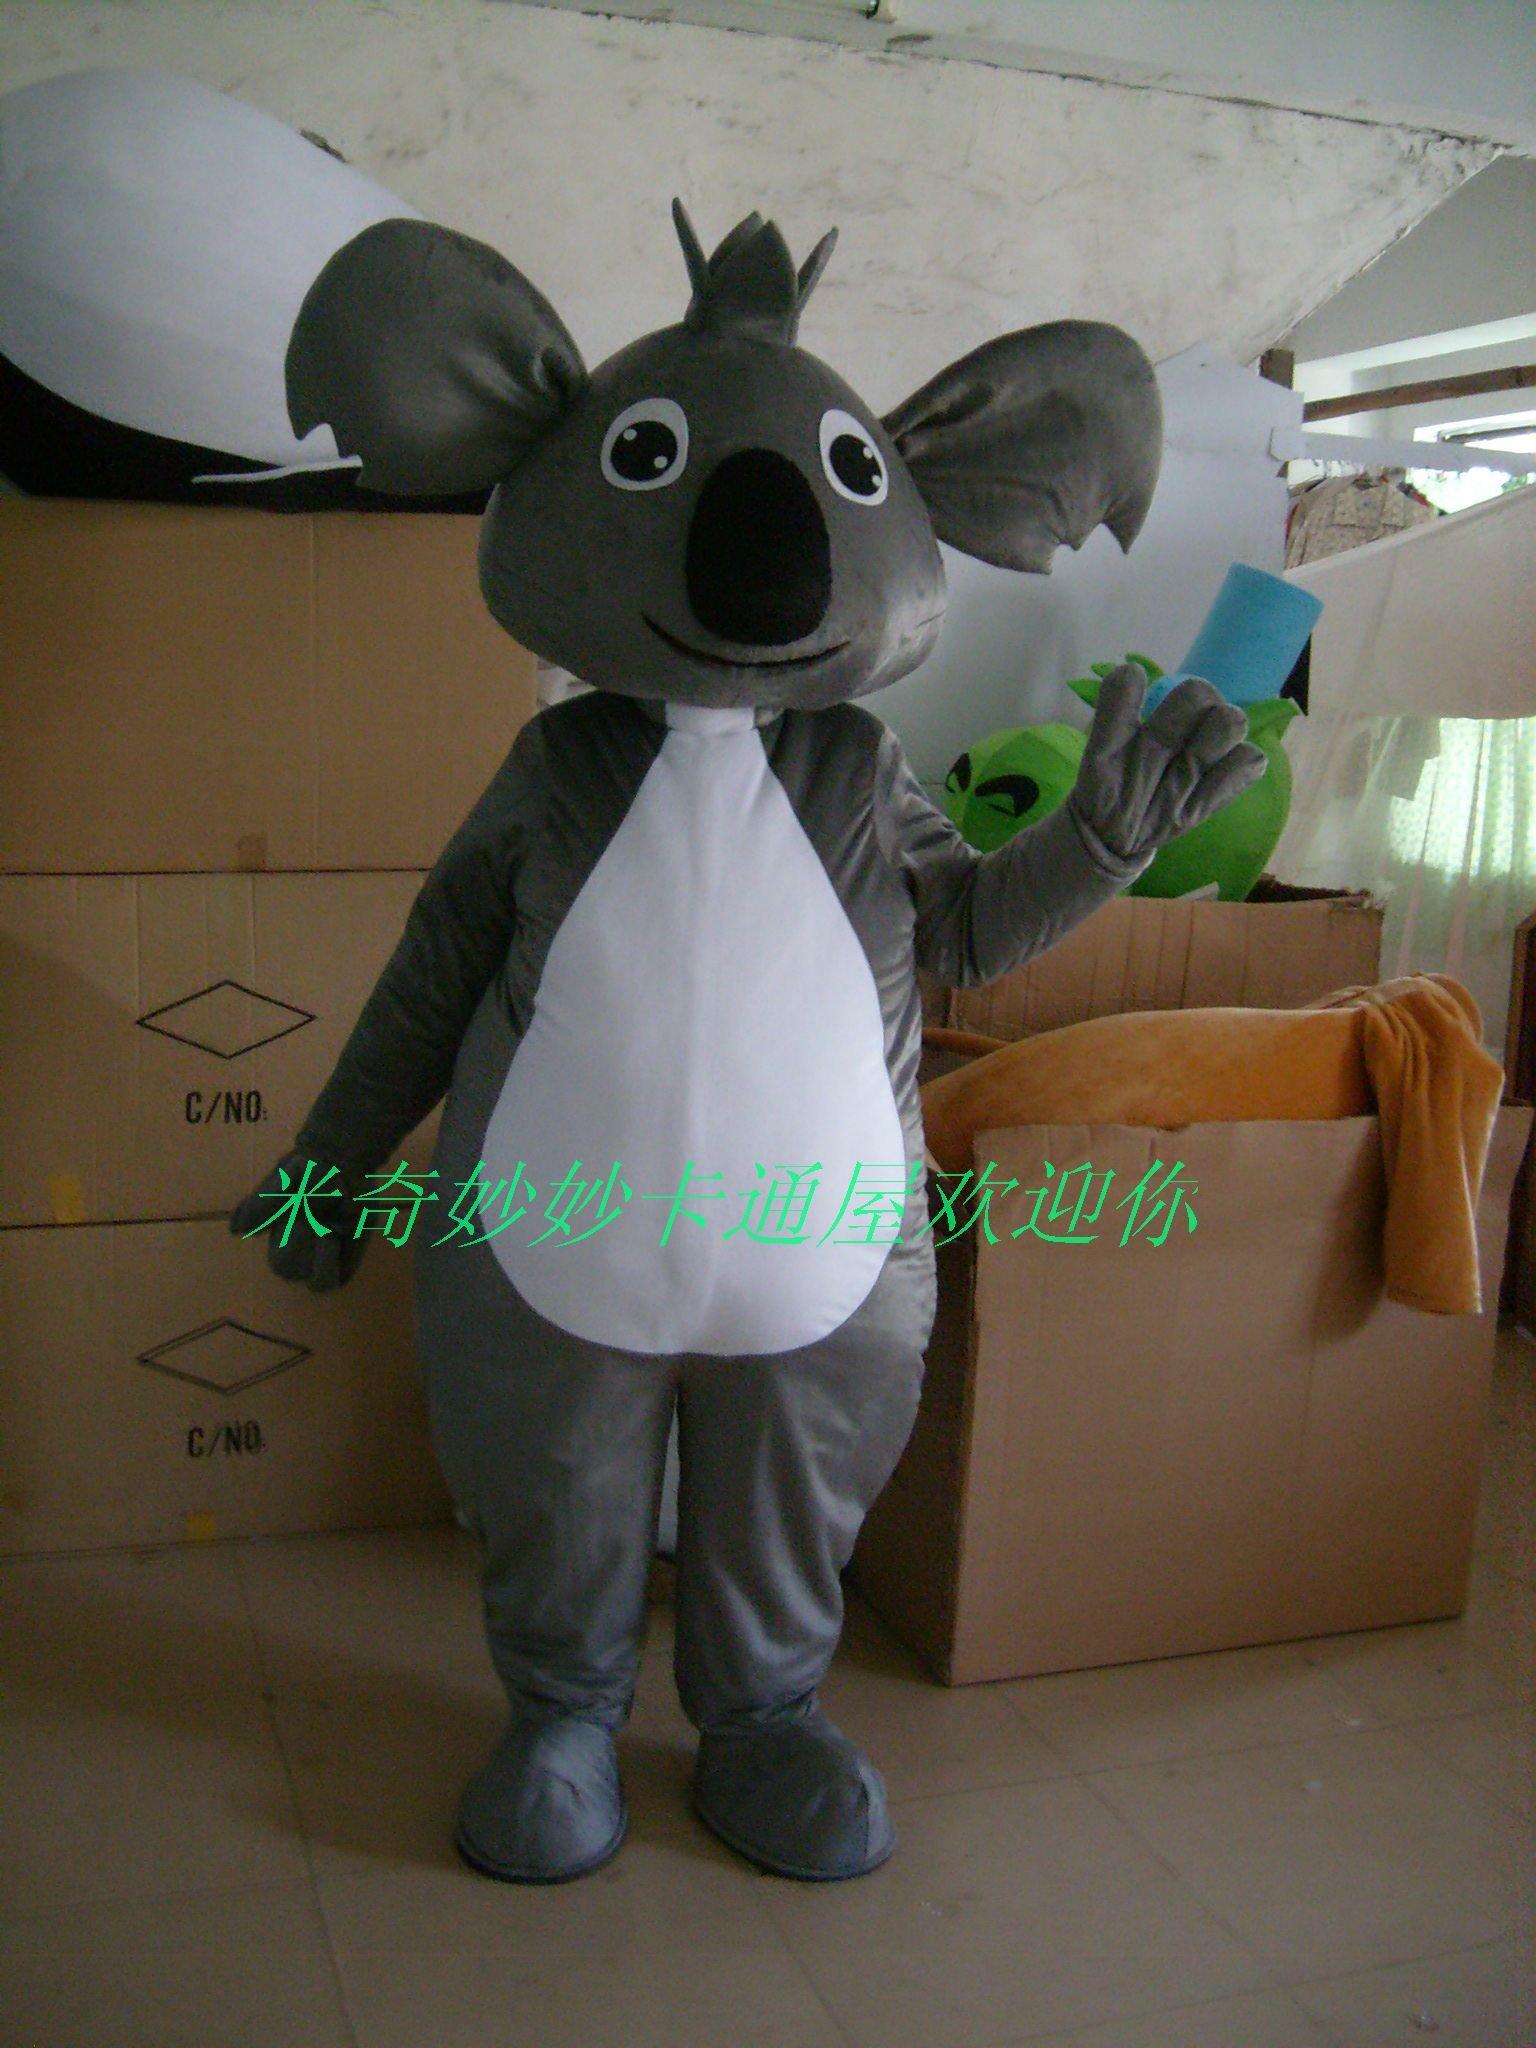 Walking Cartoon Doll Clothing Props Cartoon Costumes Show Costumes Cartoon Koala Clothing Mascot Costume